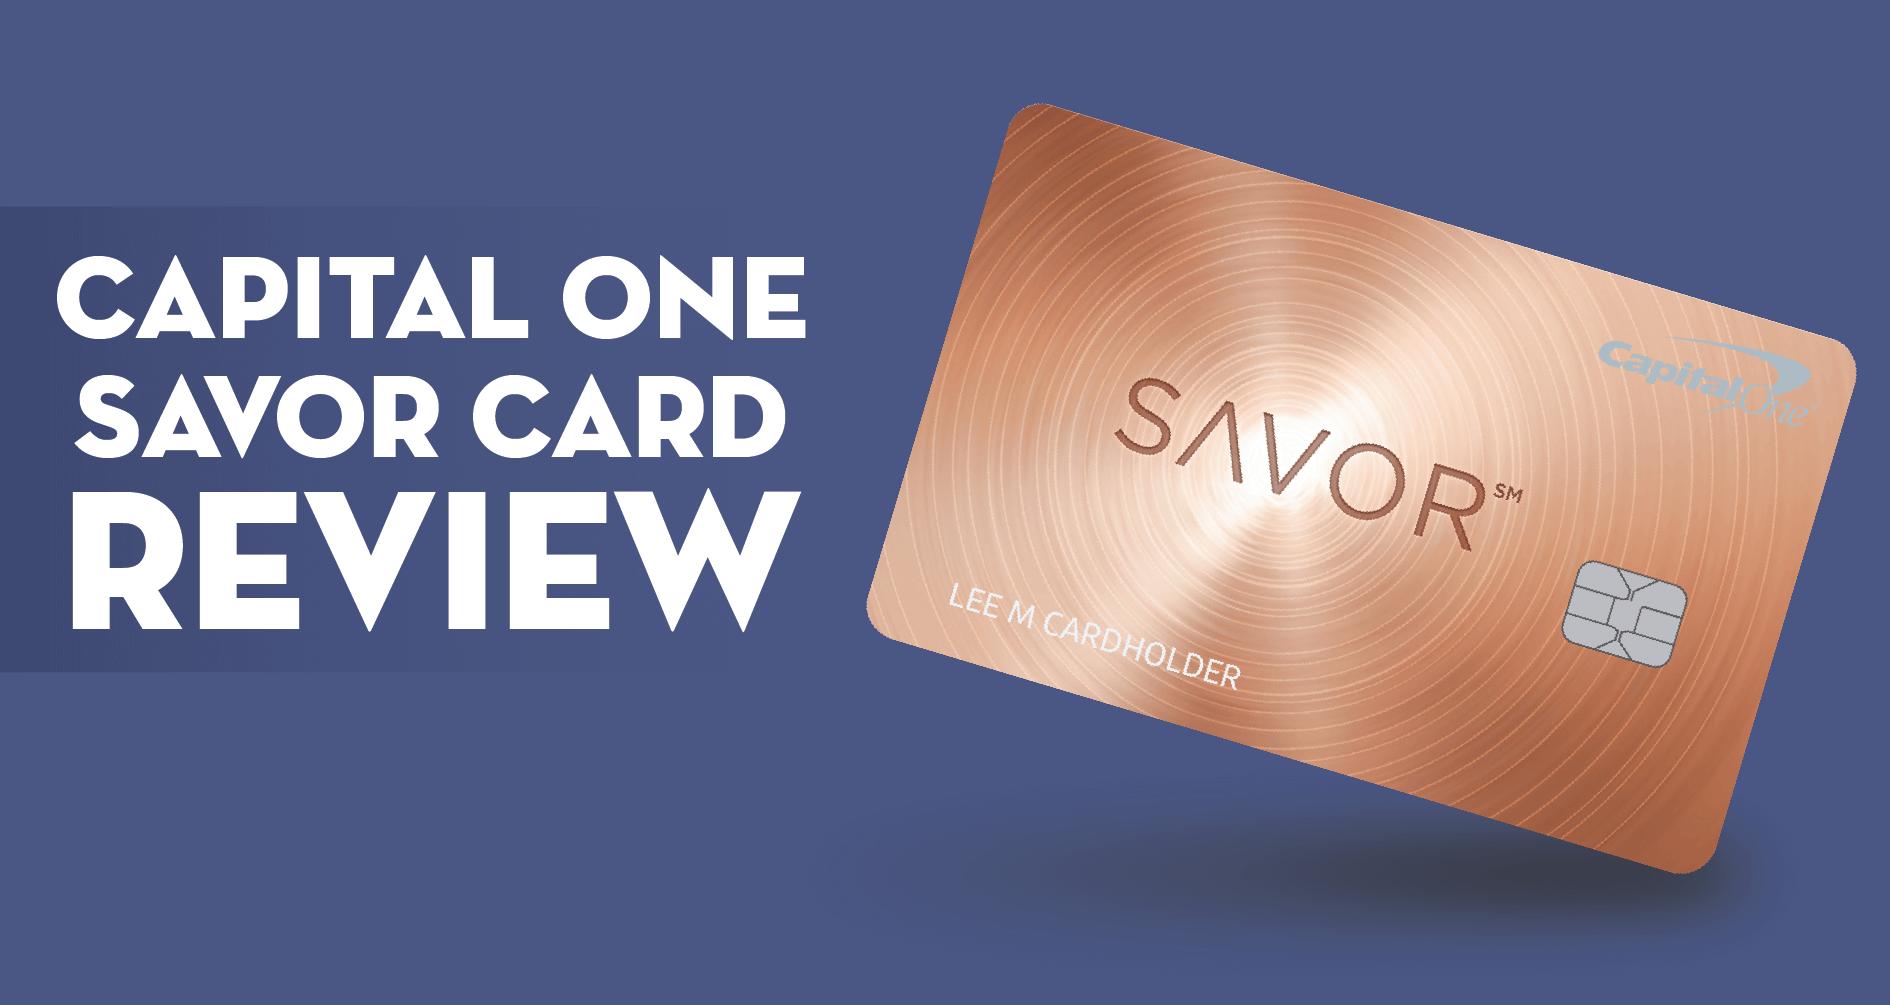 Personal Loans Online Credit Card Loans Personal Loans Online Credit Card